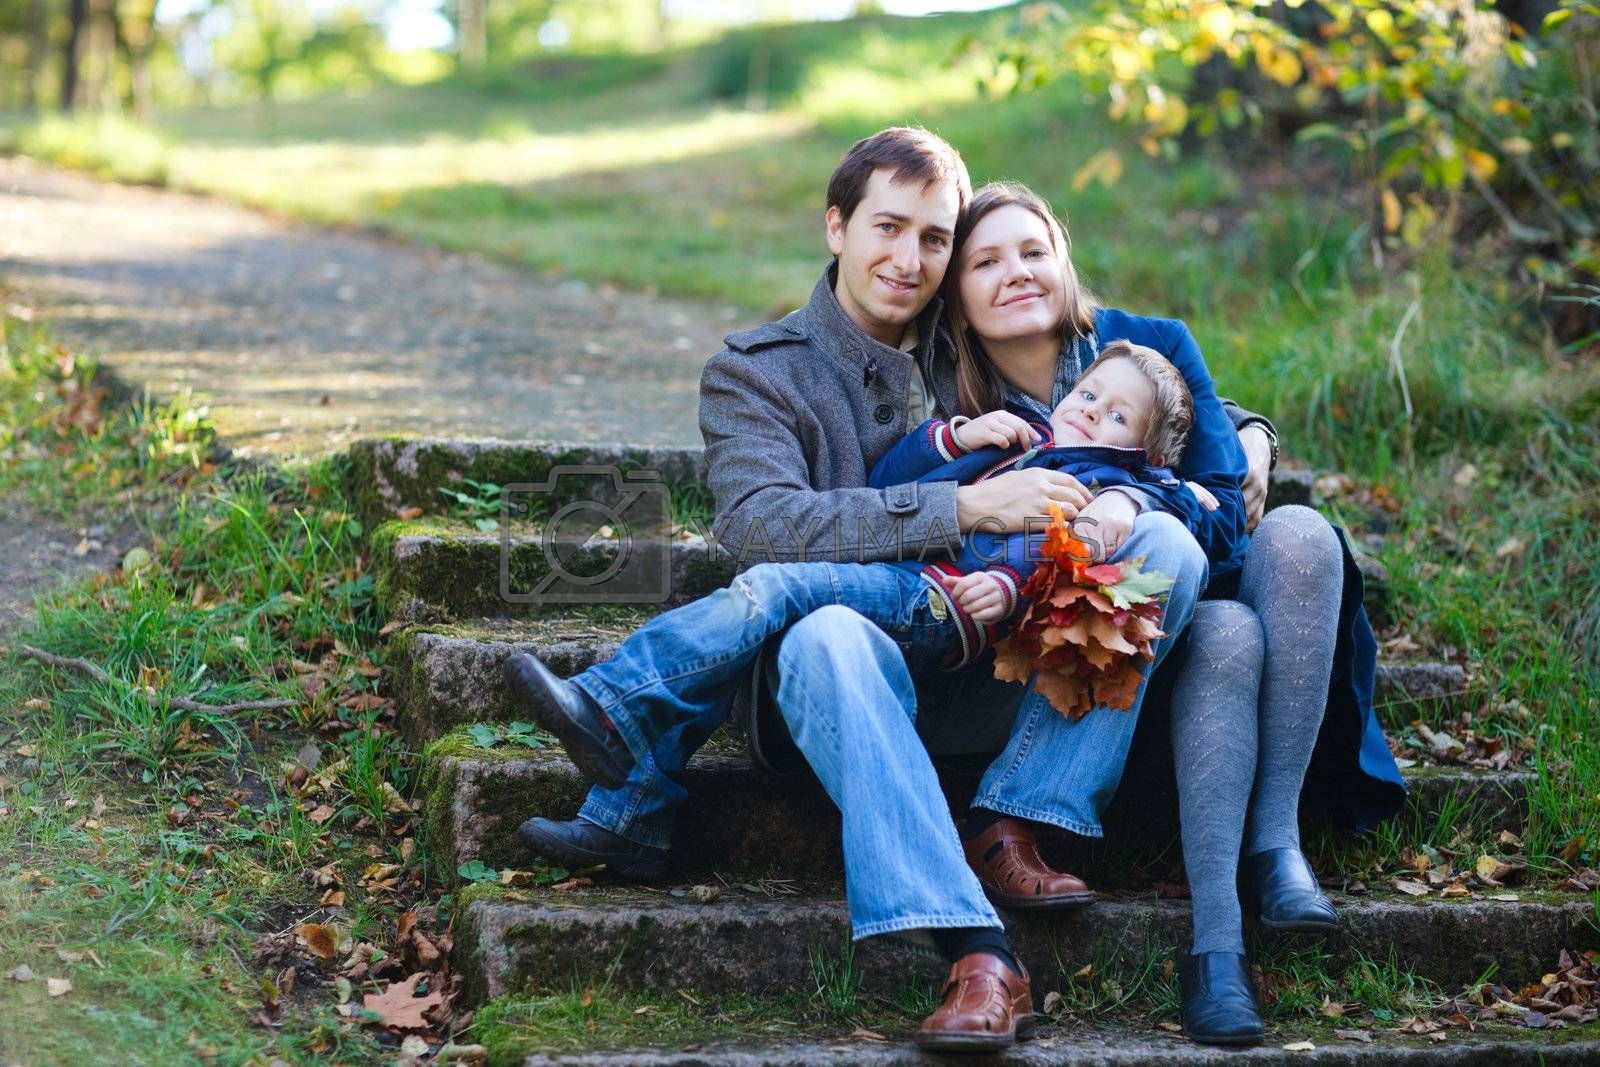 Autumn family by shalamov